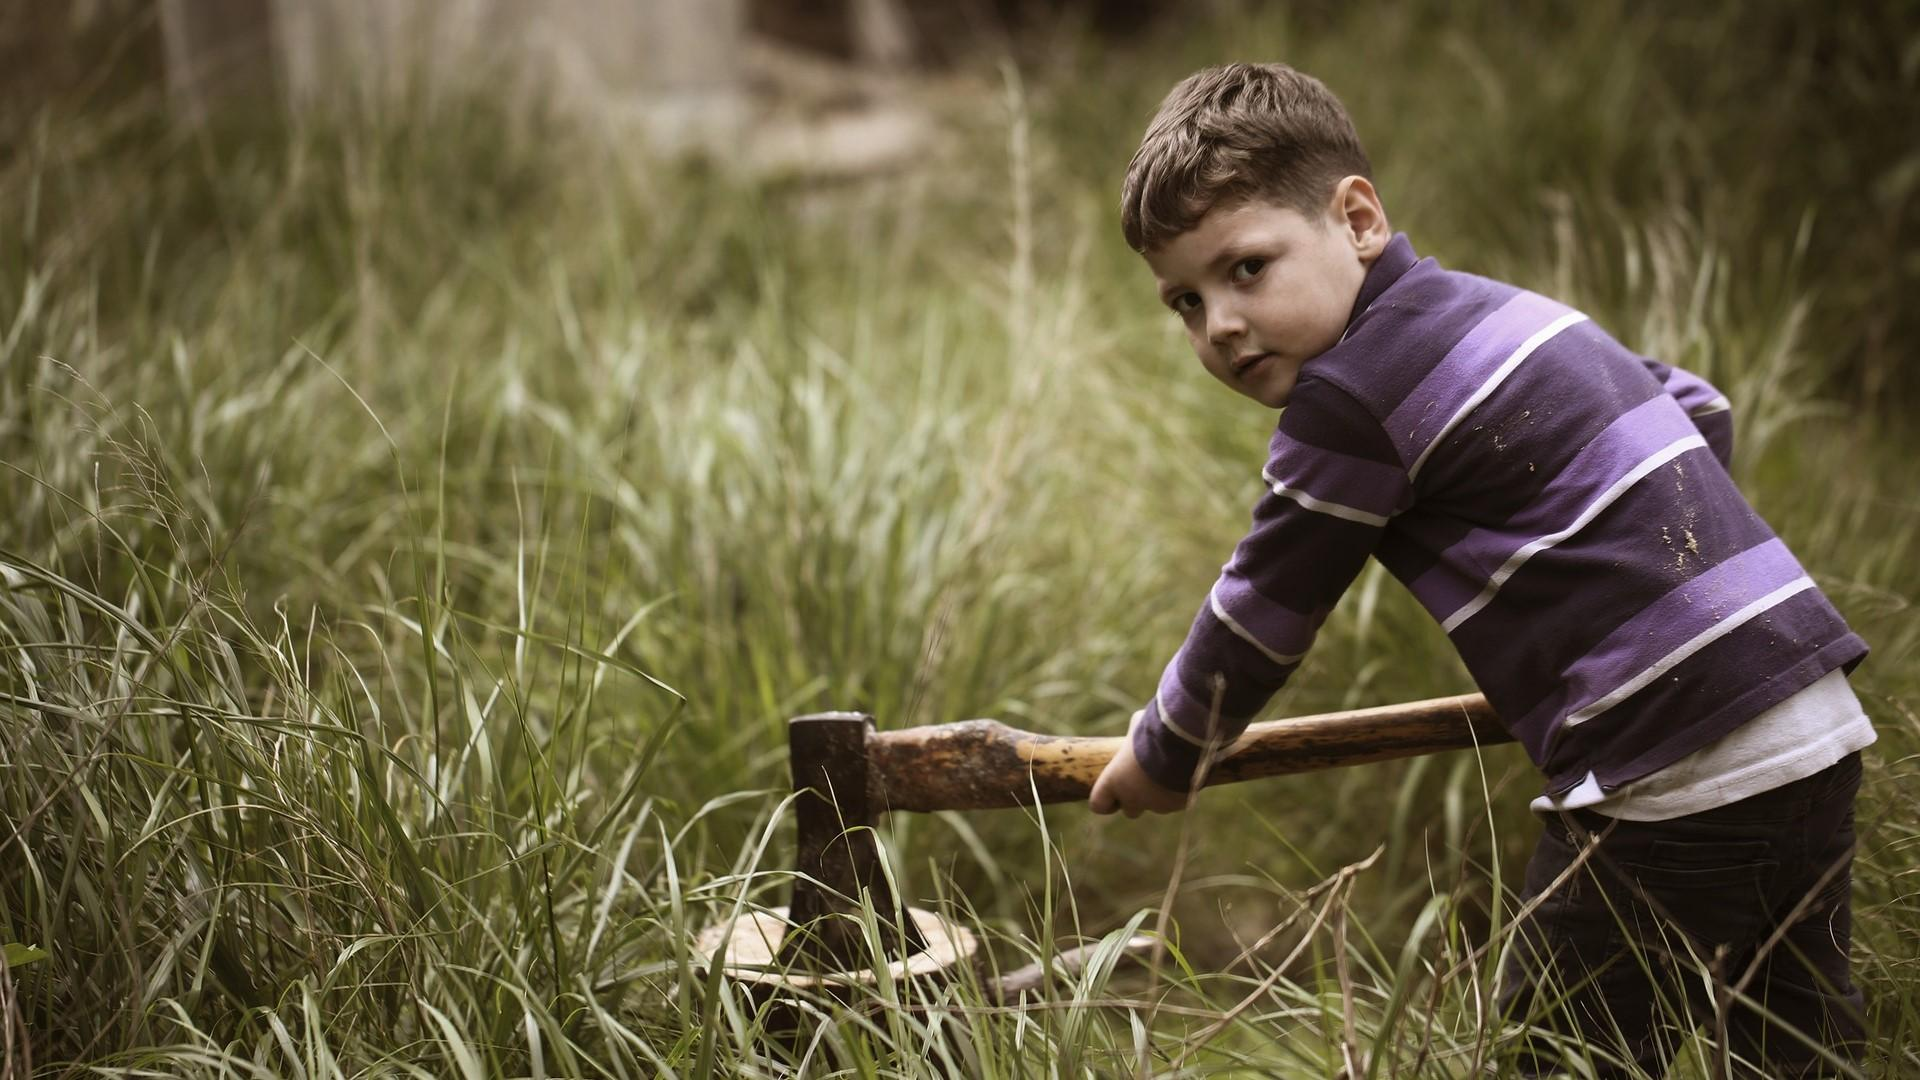 Ziel der Erziehung im Nationalsozialismus waren harte, gehorsame Kinder.